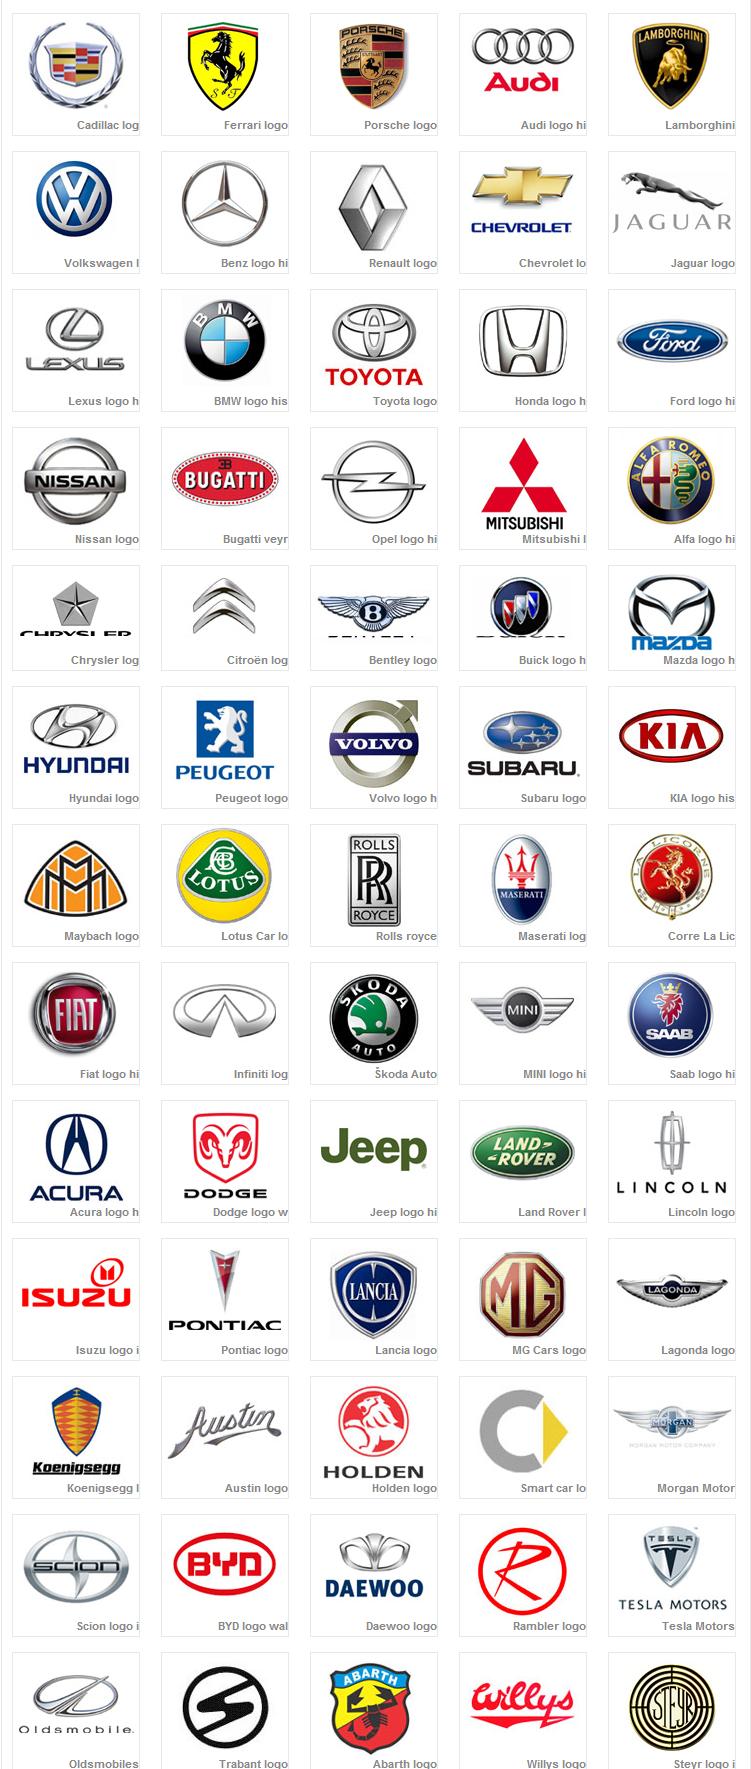 Car Logos inspiration for logo design. car based, not